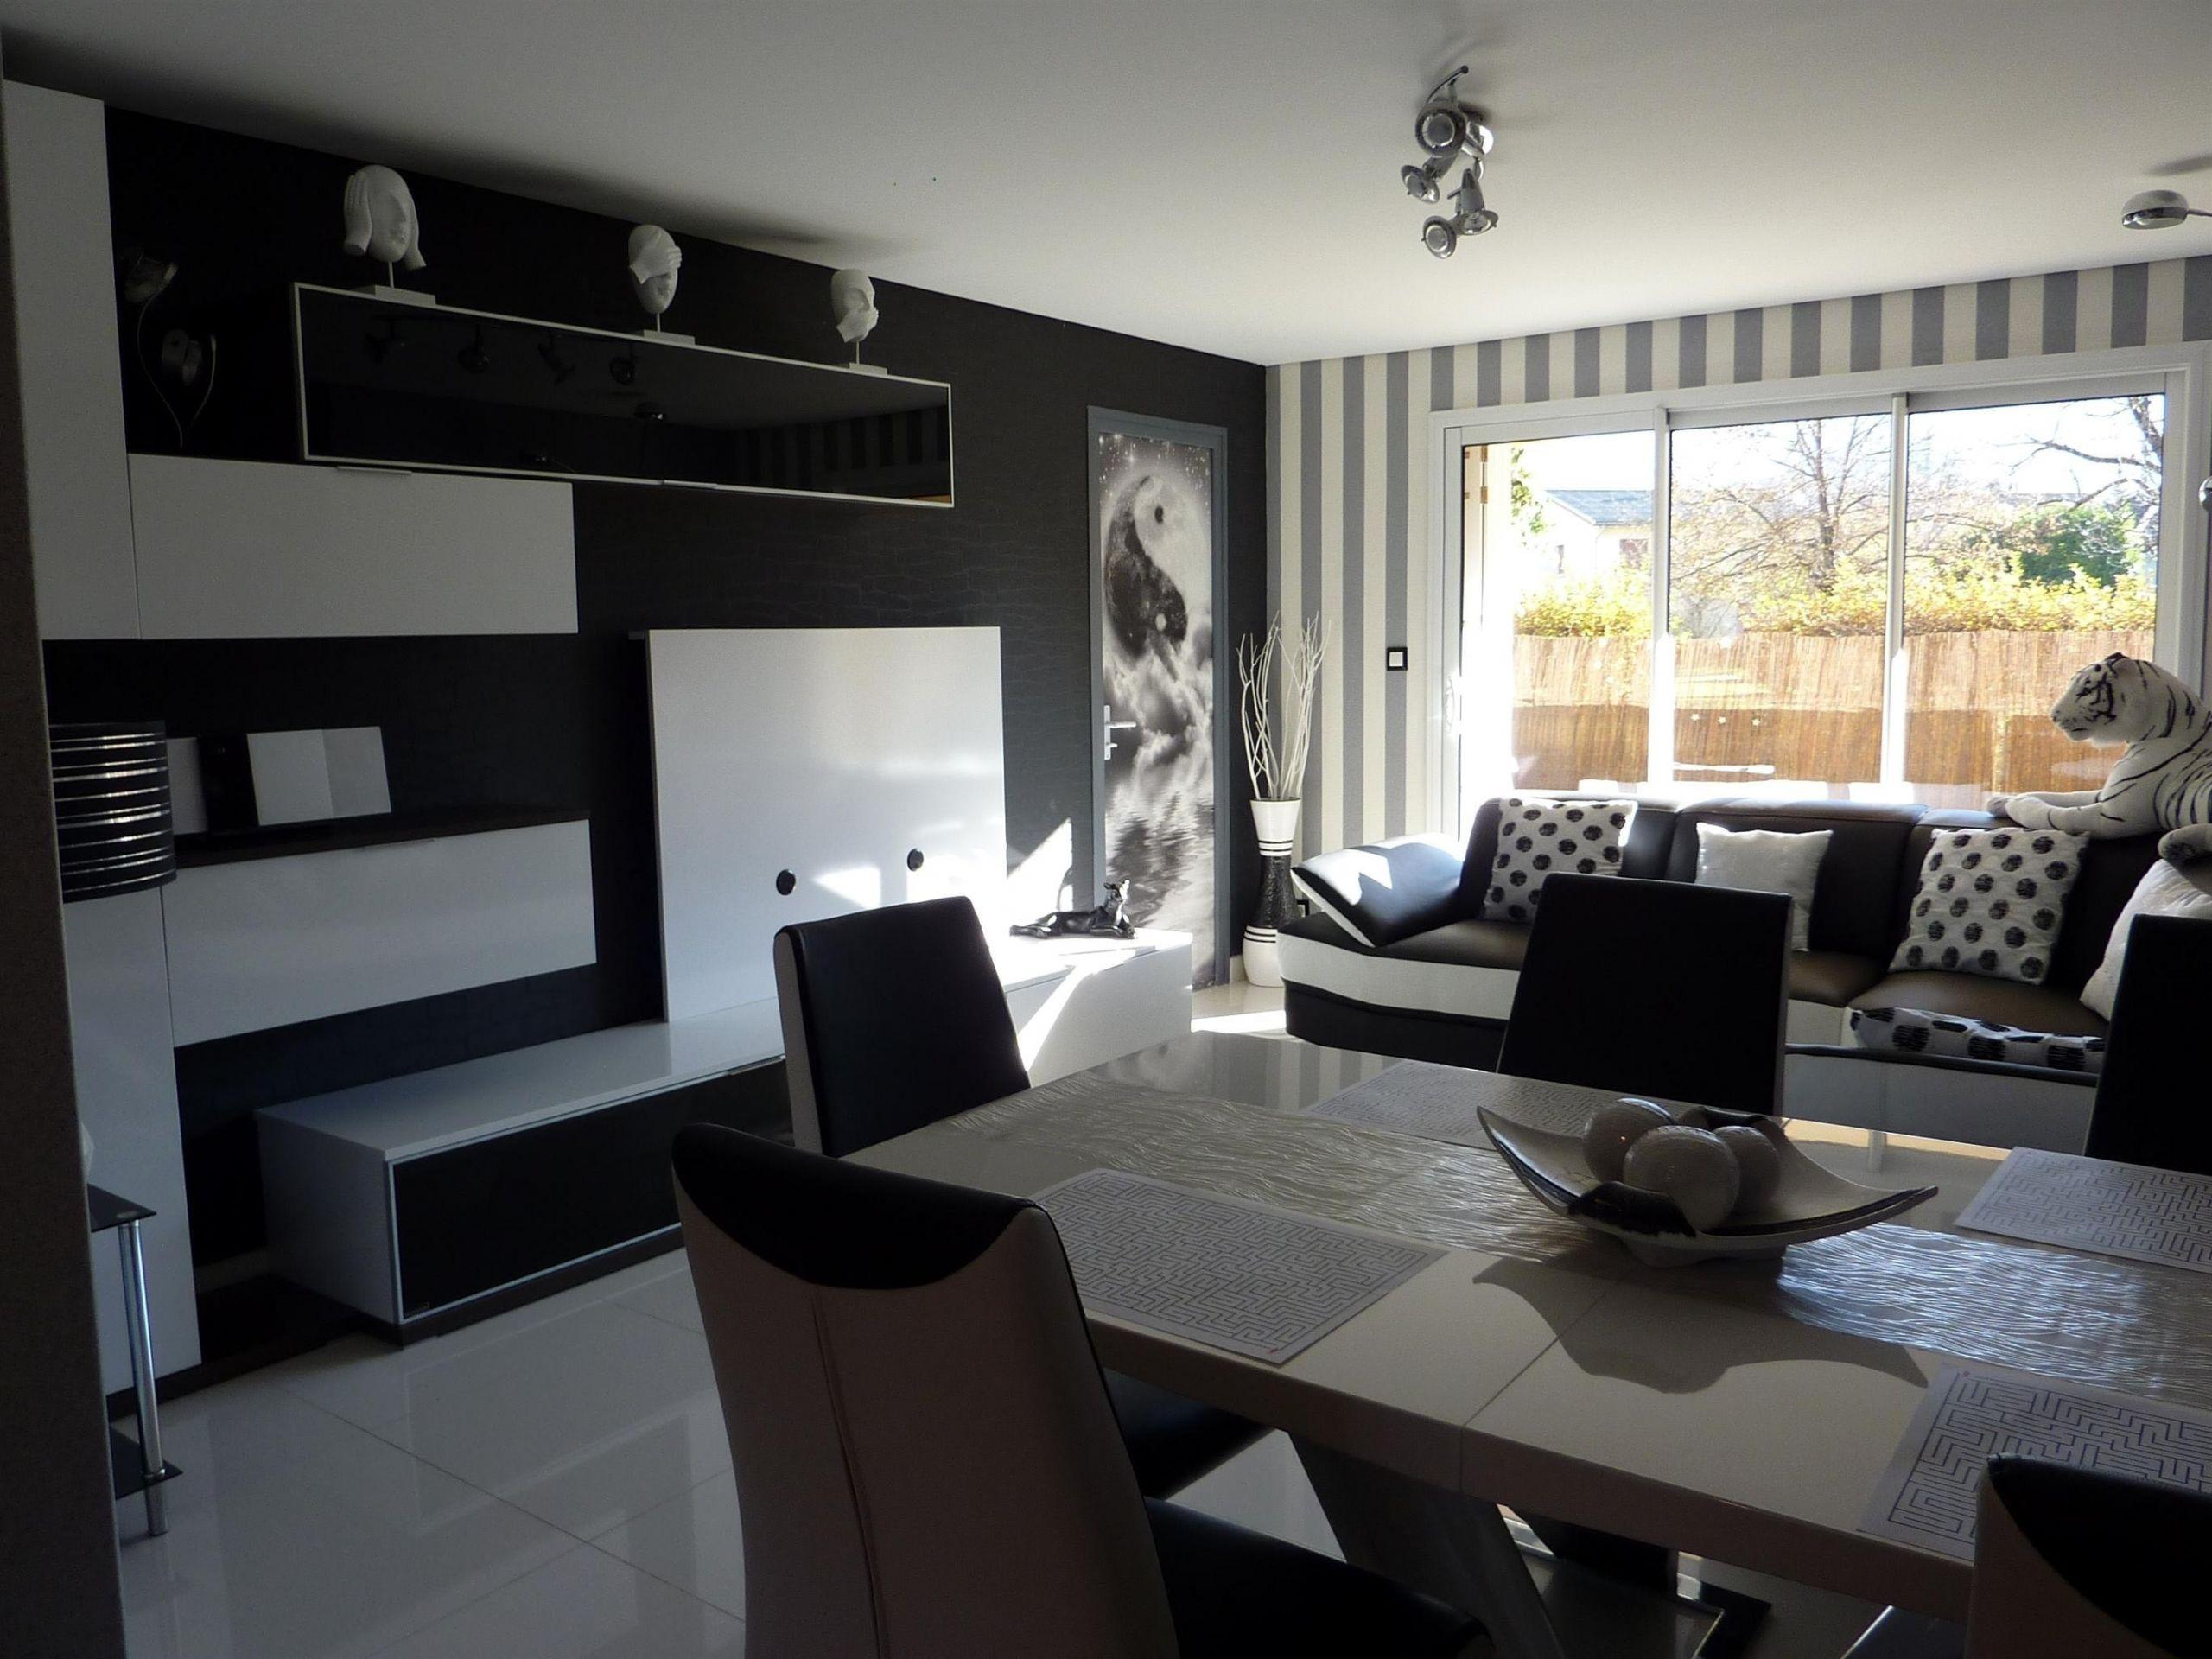 idee amenagement salon cuisine salonlgant avec m idee amenagement salon cuisine 20m2 elegant luxe 0d of 1